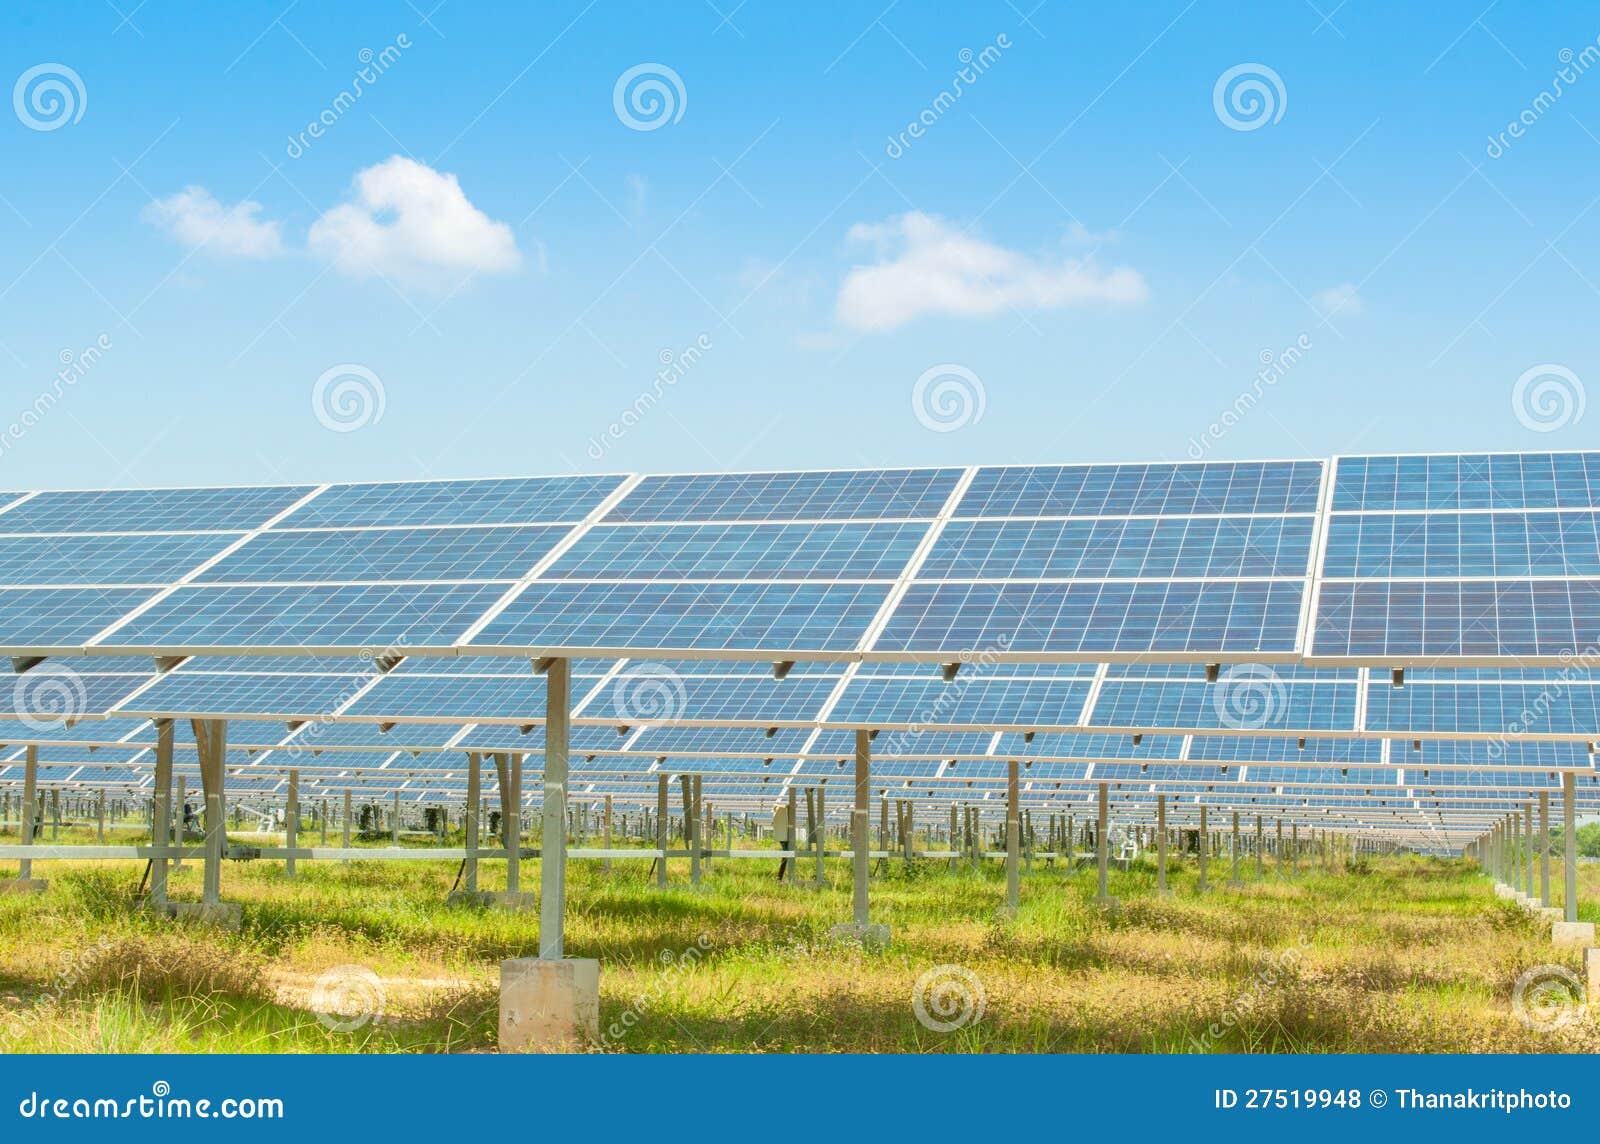 Starting a Solar Farm – Sample Business Plan Template